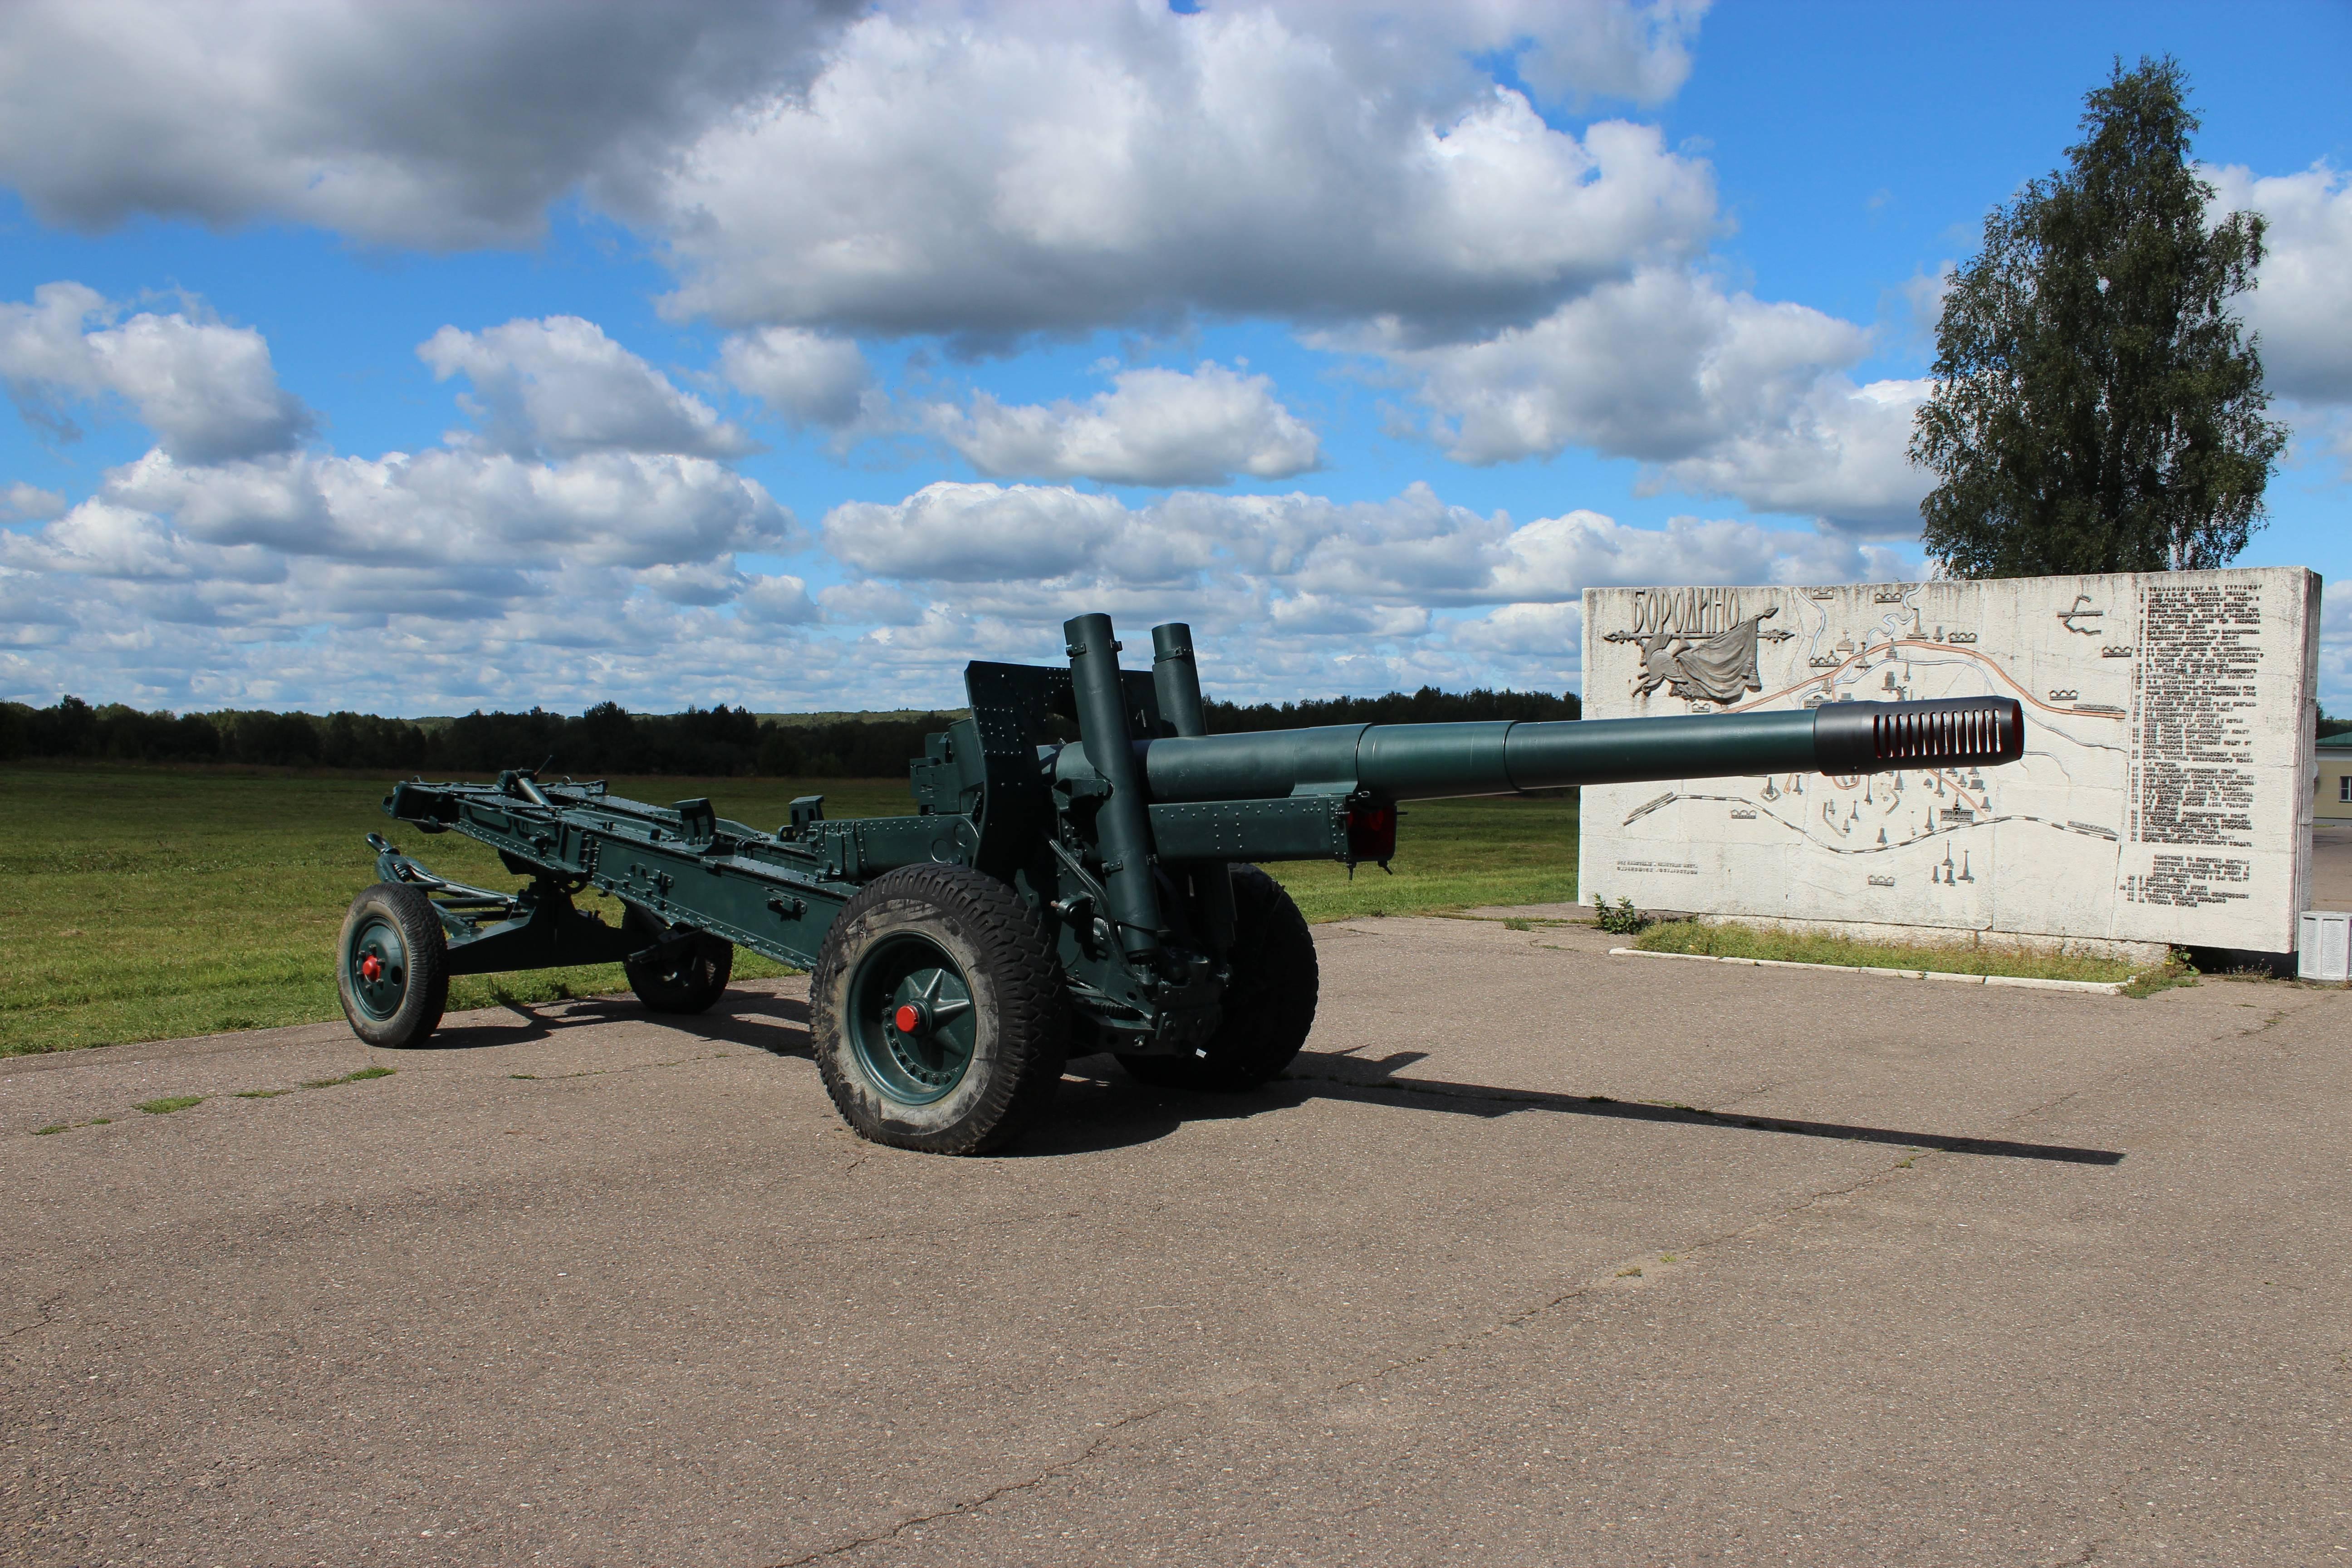 152-мм гаубица-пушка образца 1937 года (мл-20) ²